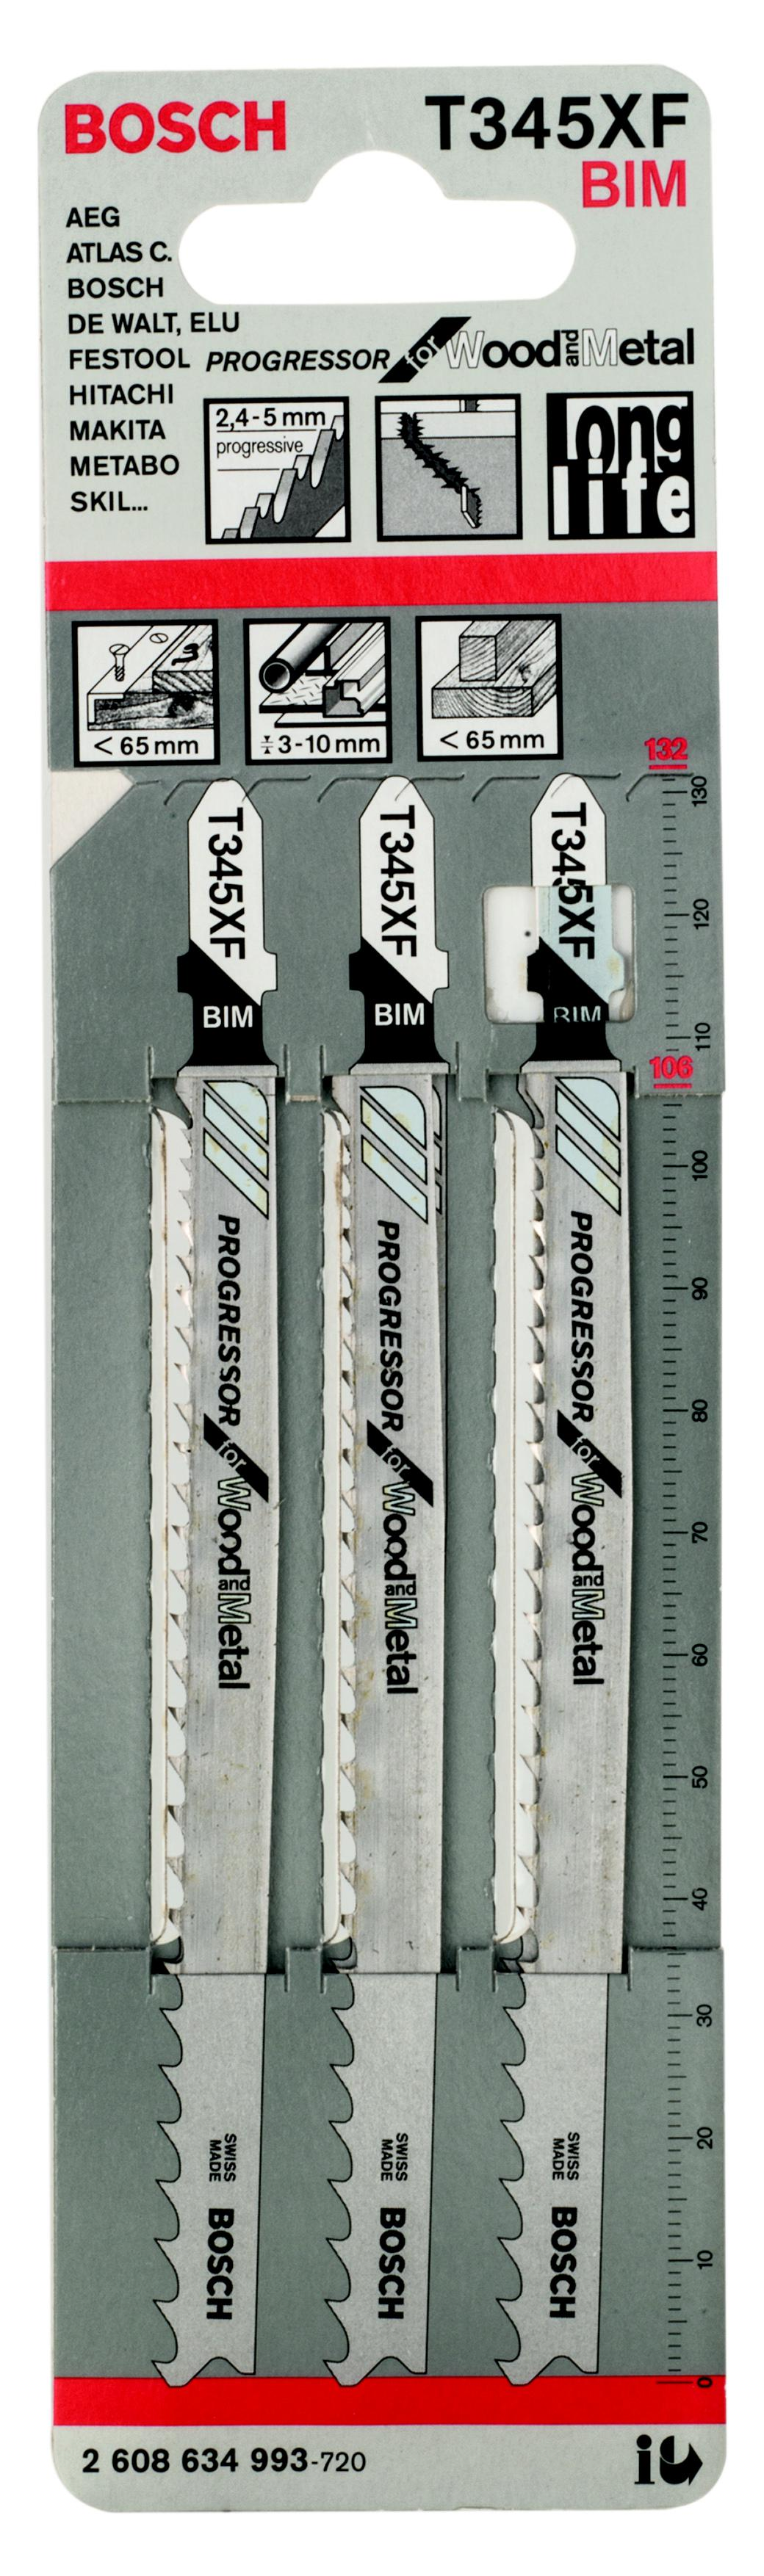 Пилки для лобзика Bosch T345xf progressor (2.608.634.993) пилки для лобзика bosch t345xf progressor 2 608 634 993